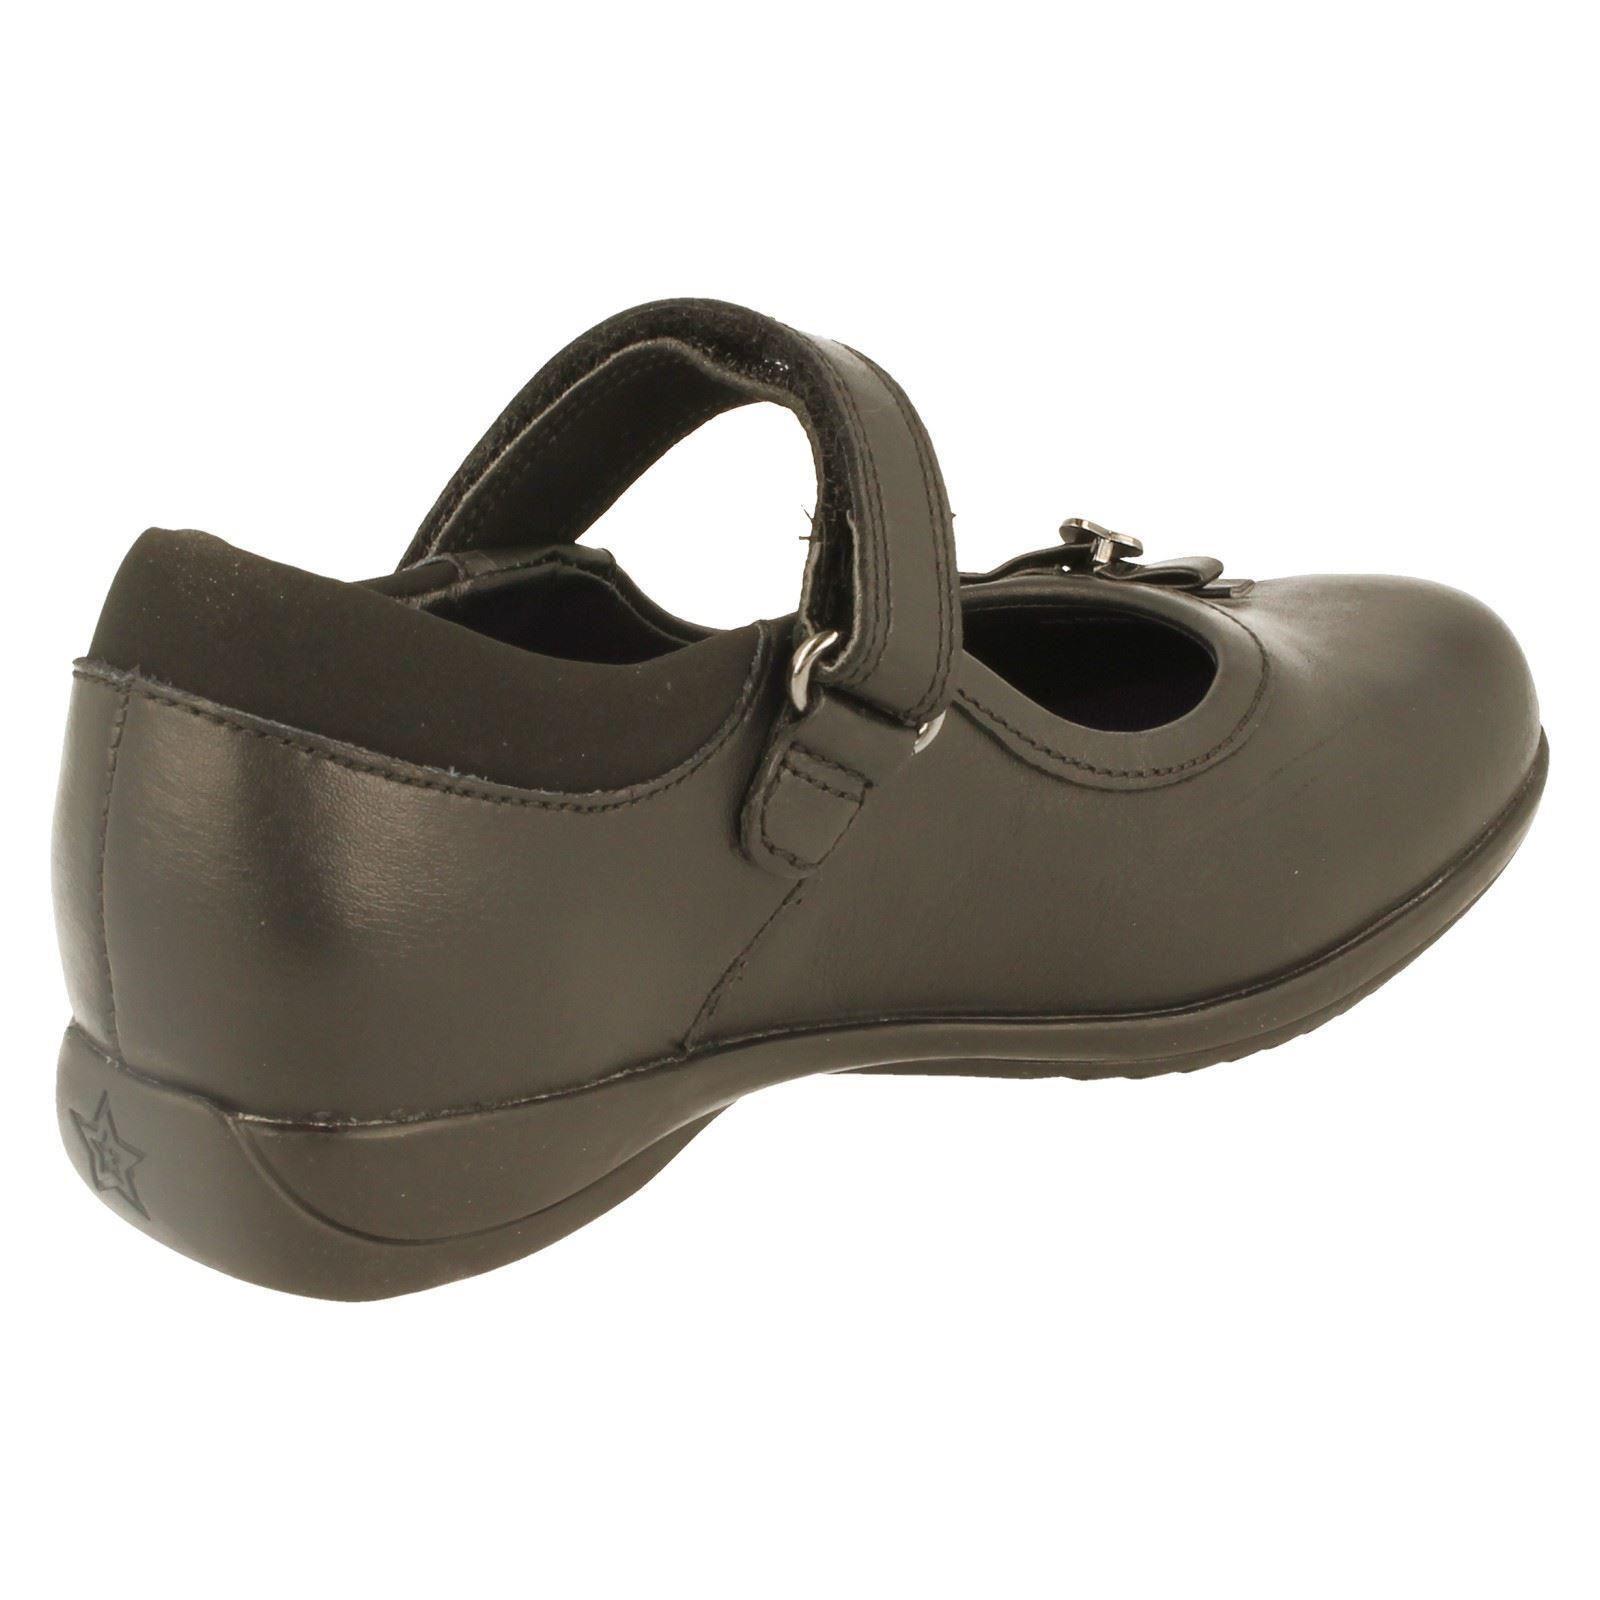 Girls Clarks Formal/School Shoes Daisy Gleam